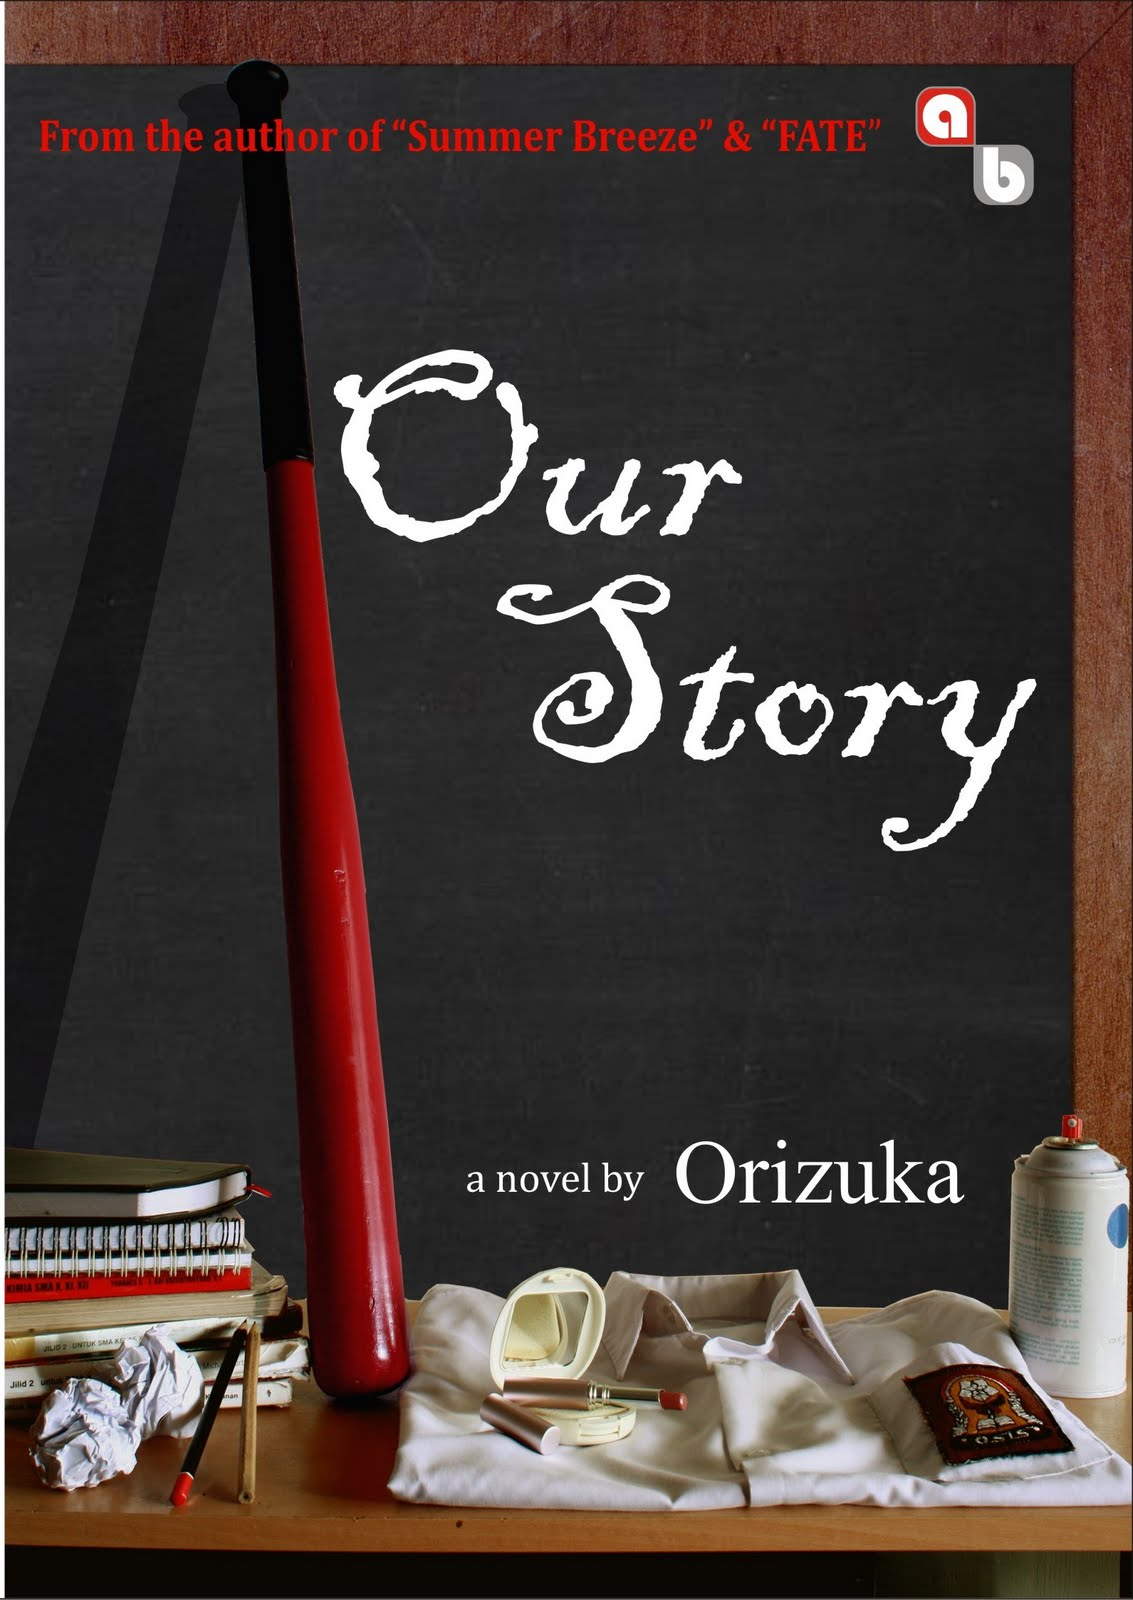 Orizuka - Our Story